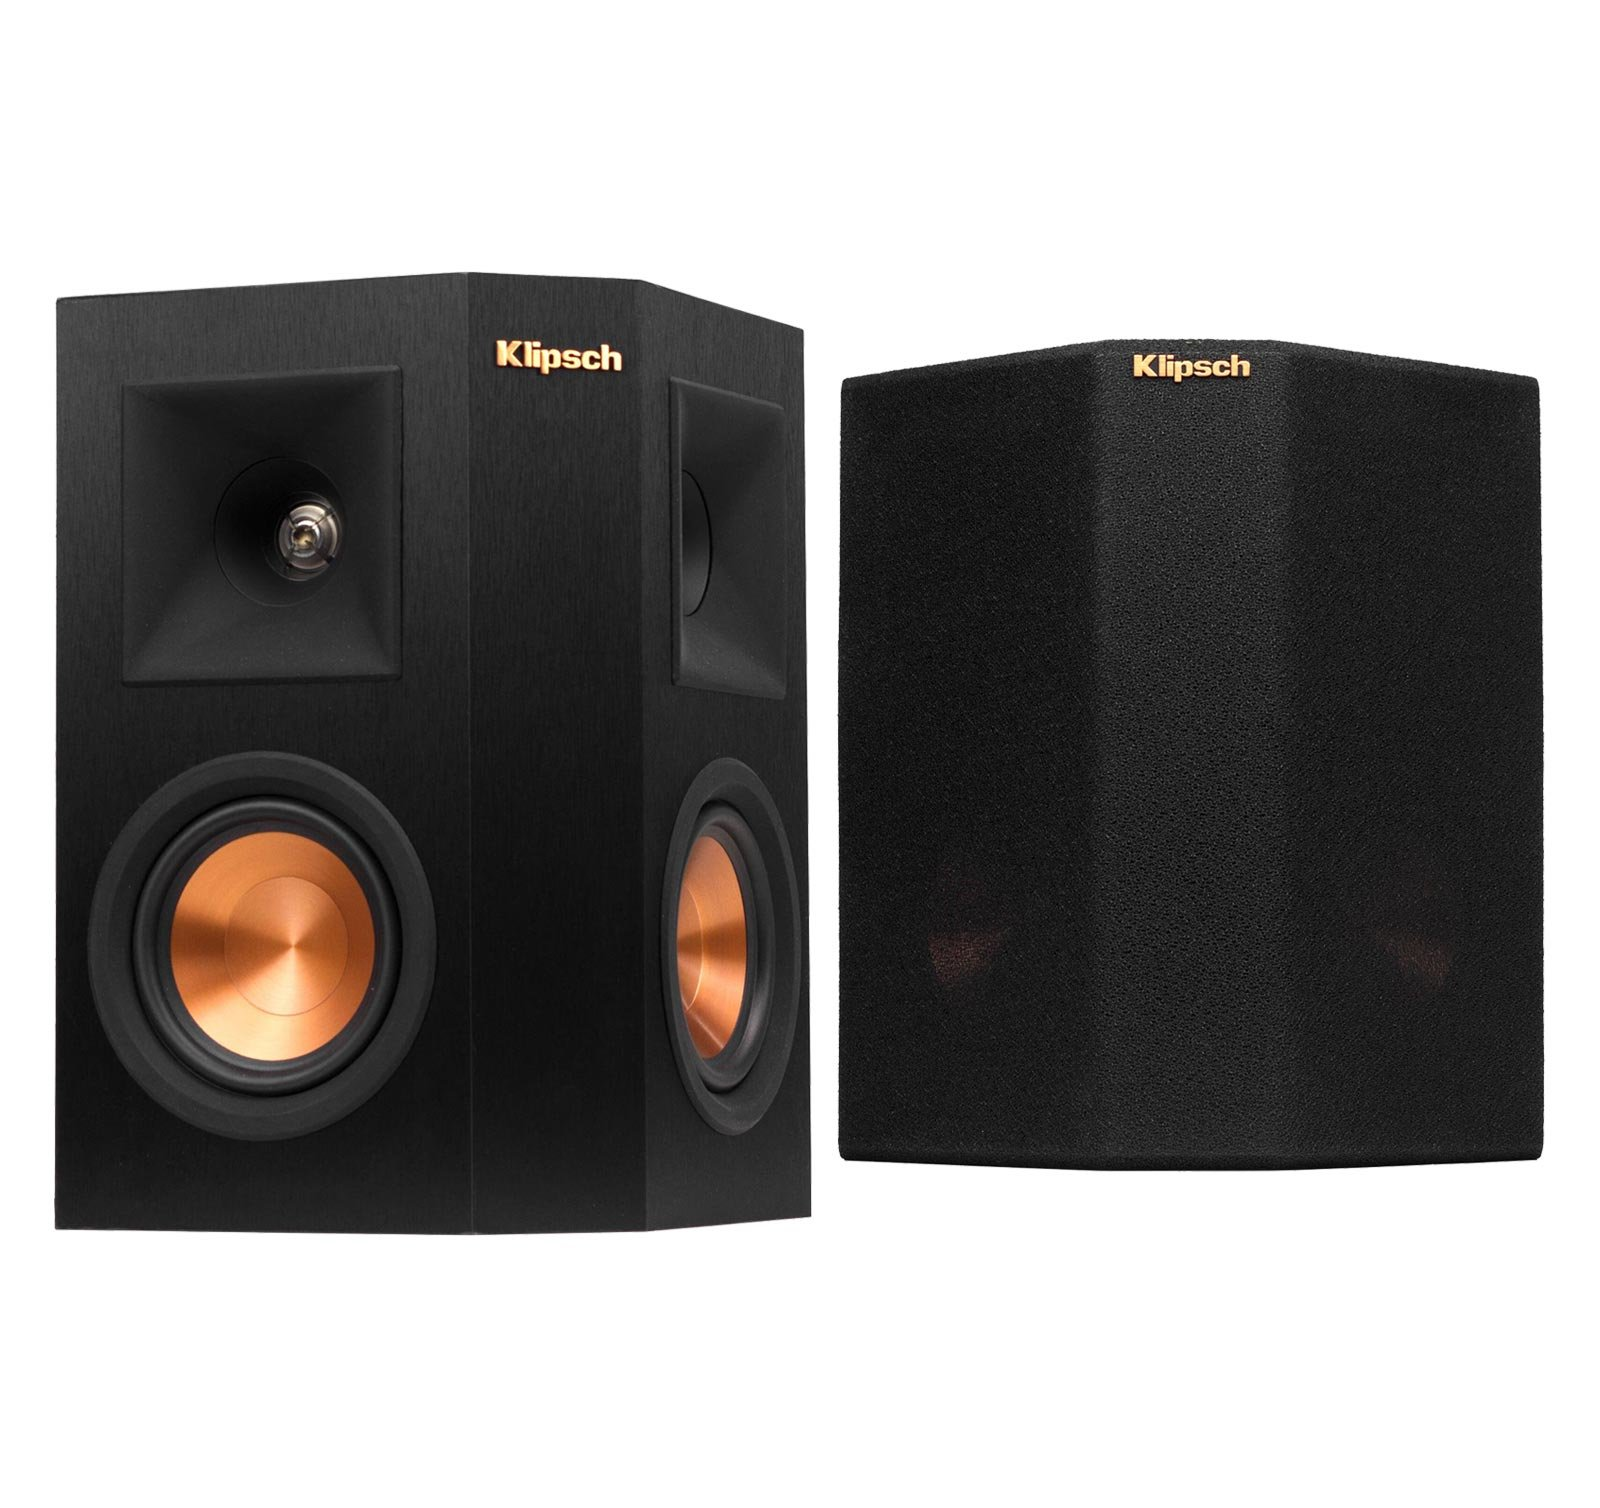 Klipsch RP-240S Reference Premiere Surround Speakers - Ebony, Pair (Certified Refurbished)